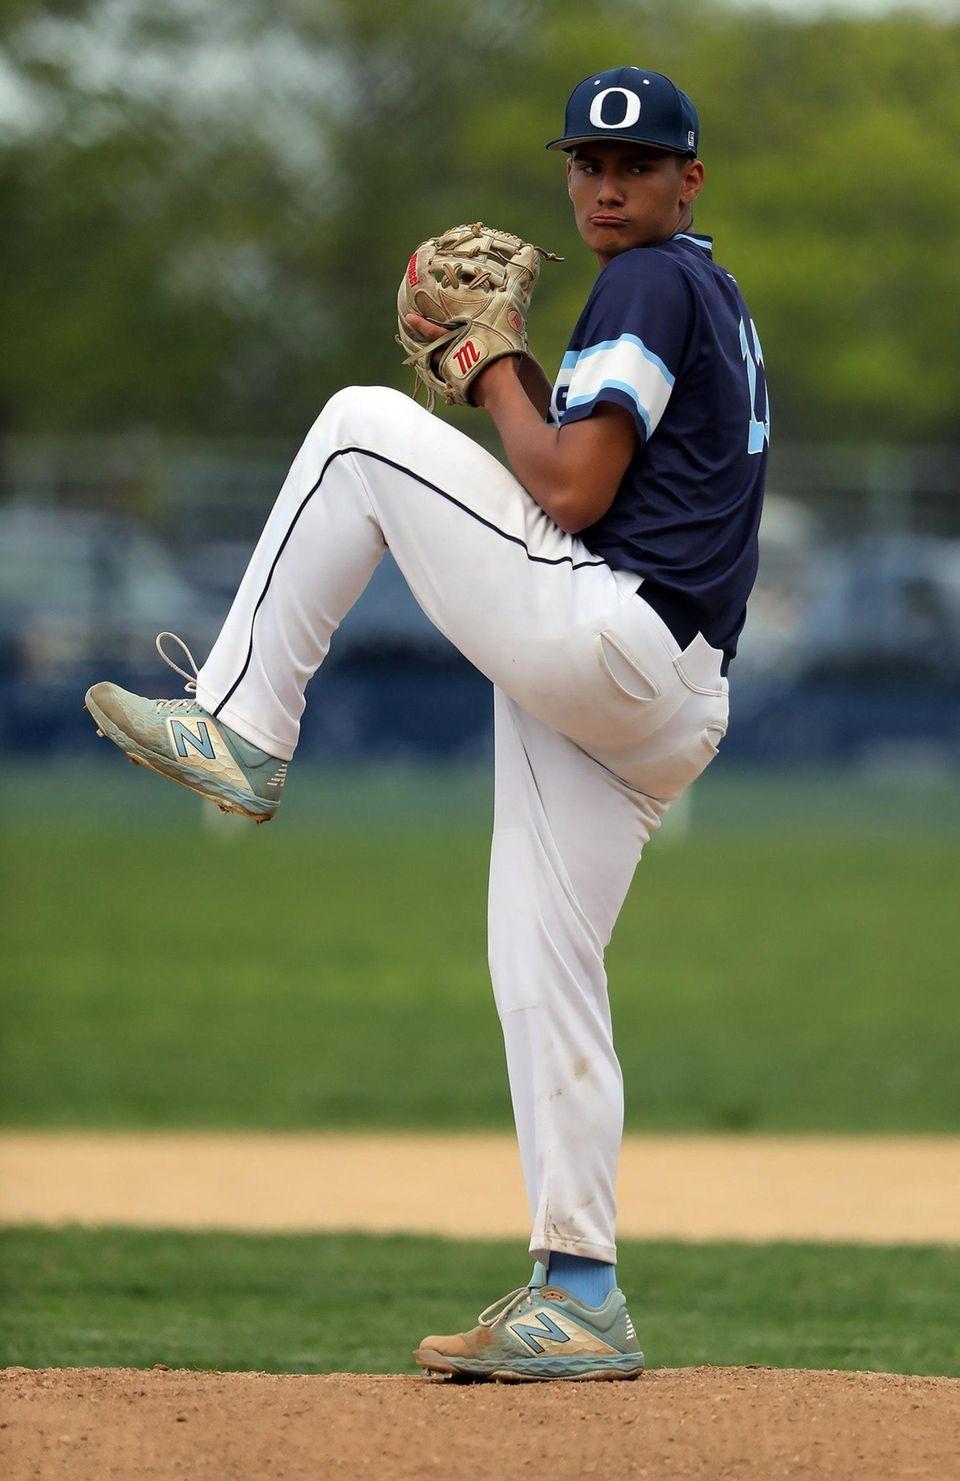 Oceanside's starting pitcher Leo Alvarez (11) winds up